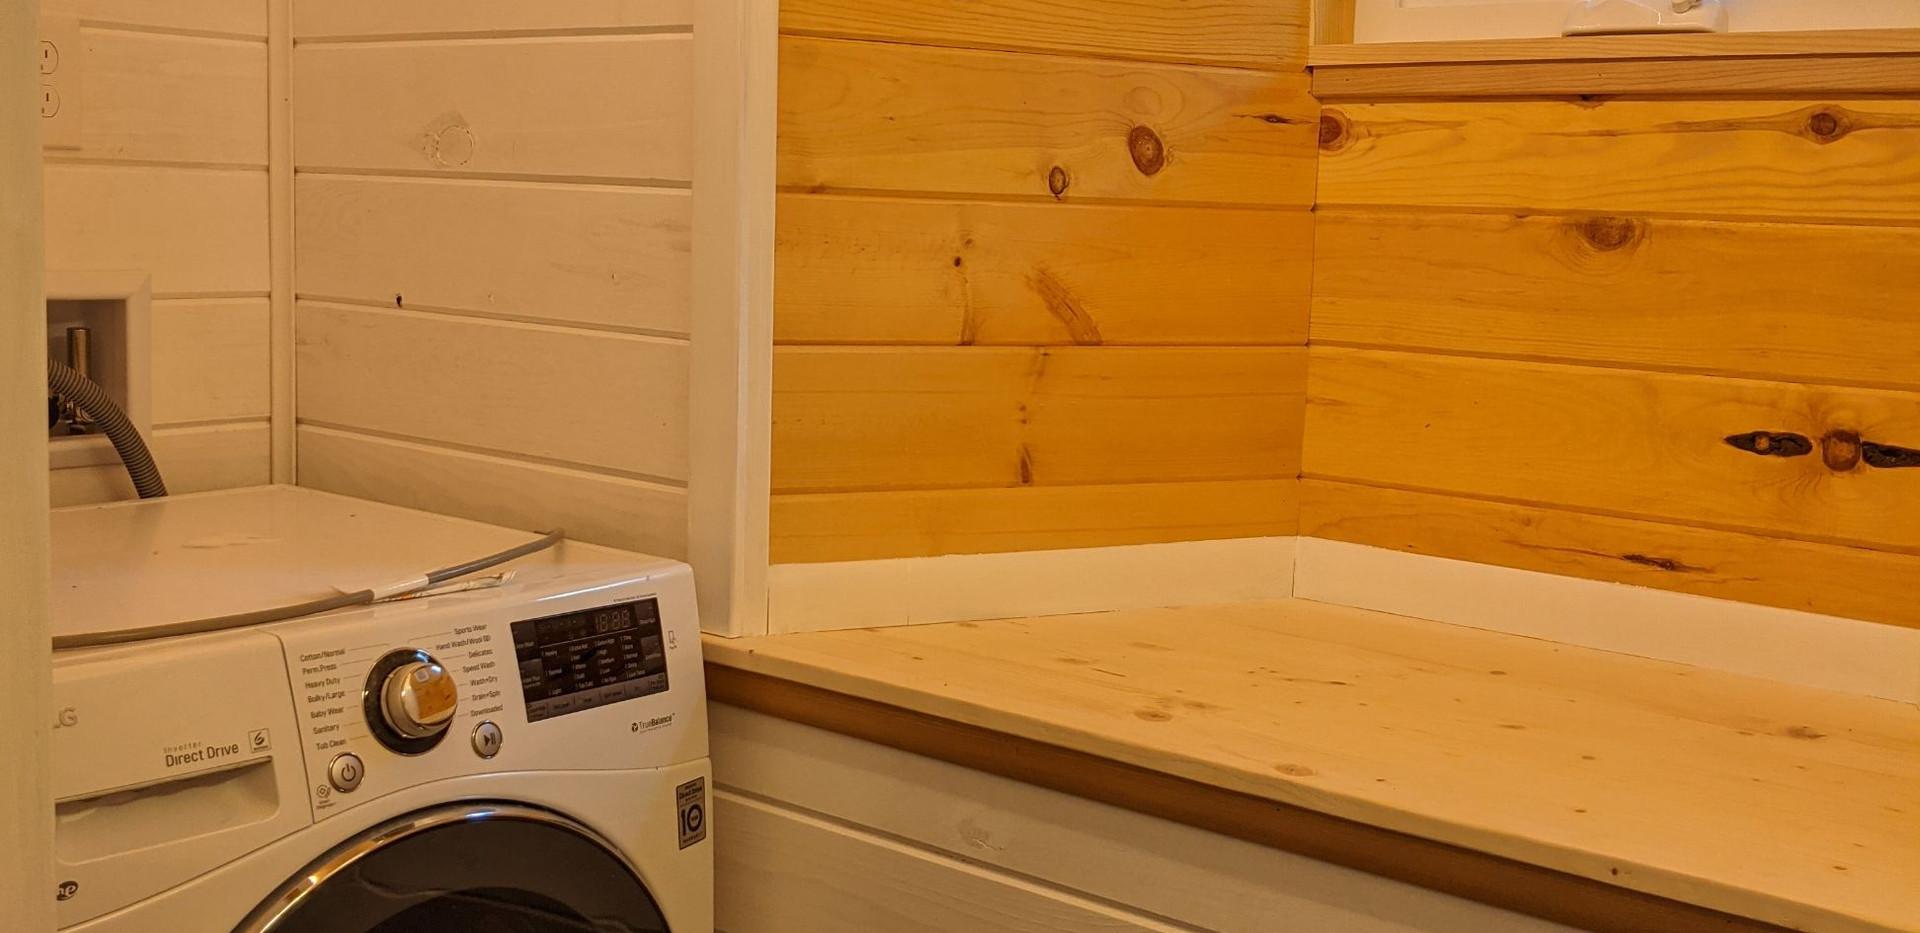 Ventless washer/dryer combo